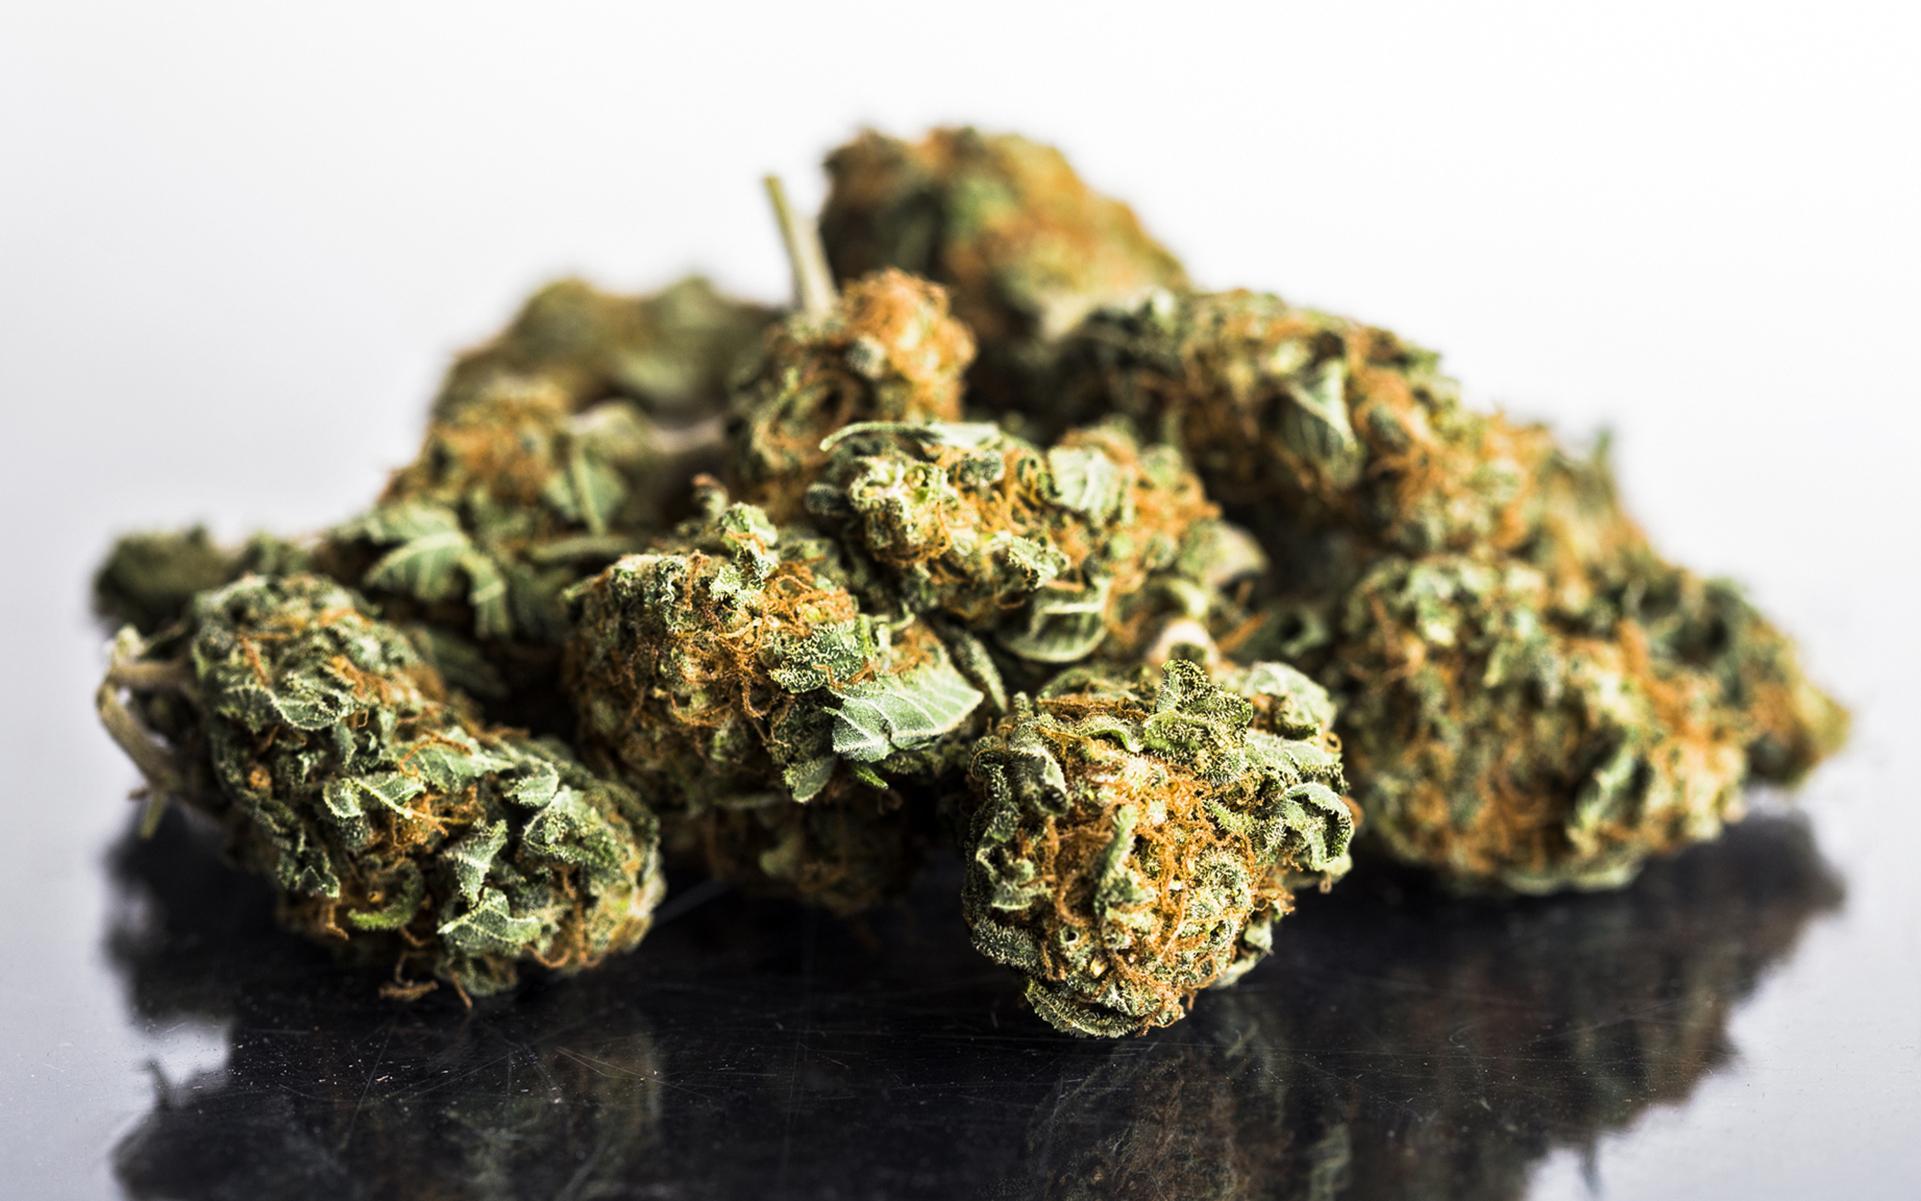 Marijuana high in thc